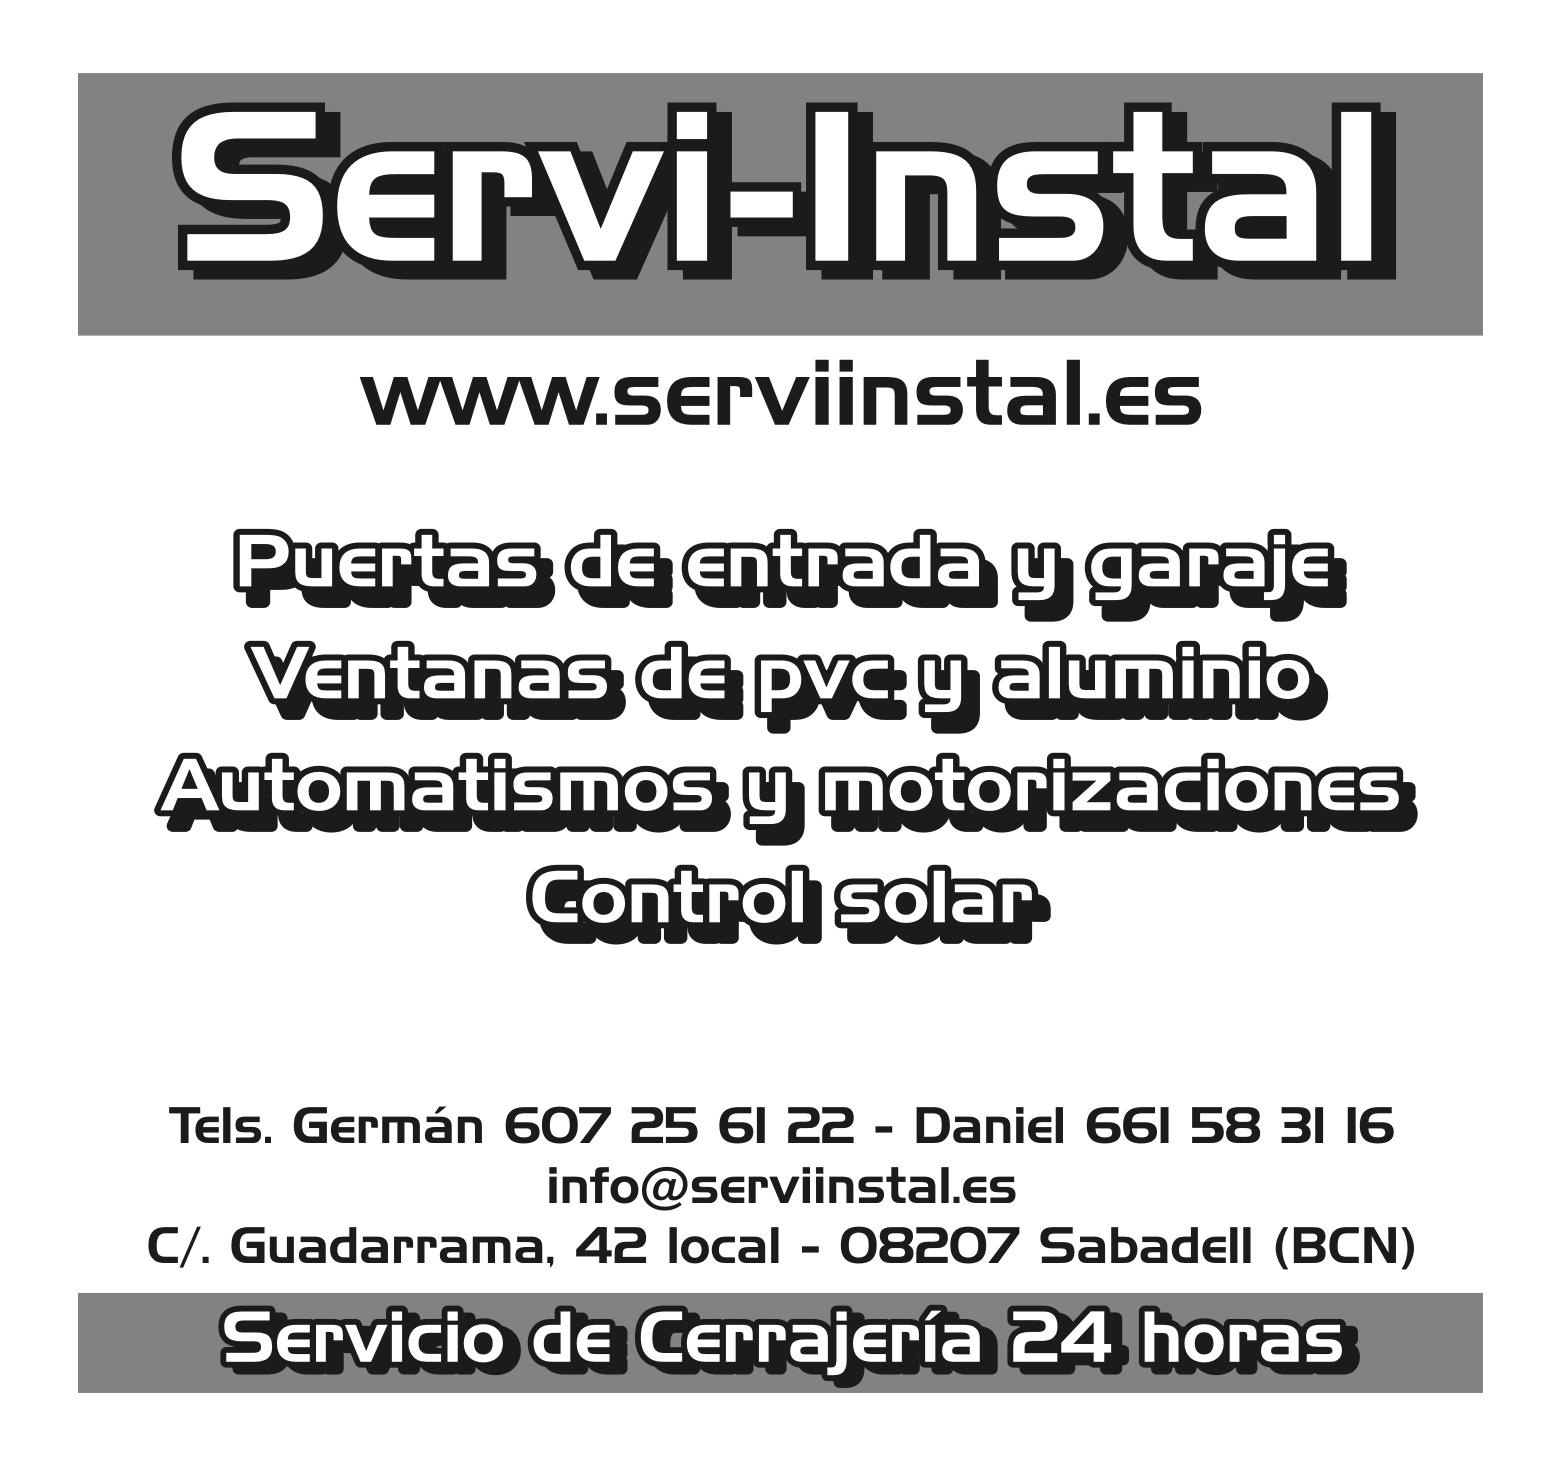 Servi-instal Scp